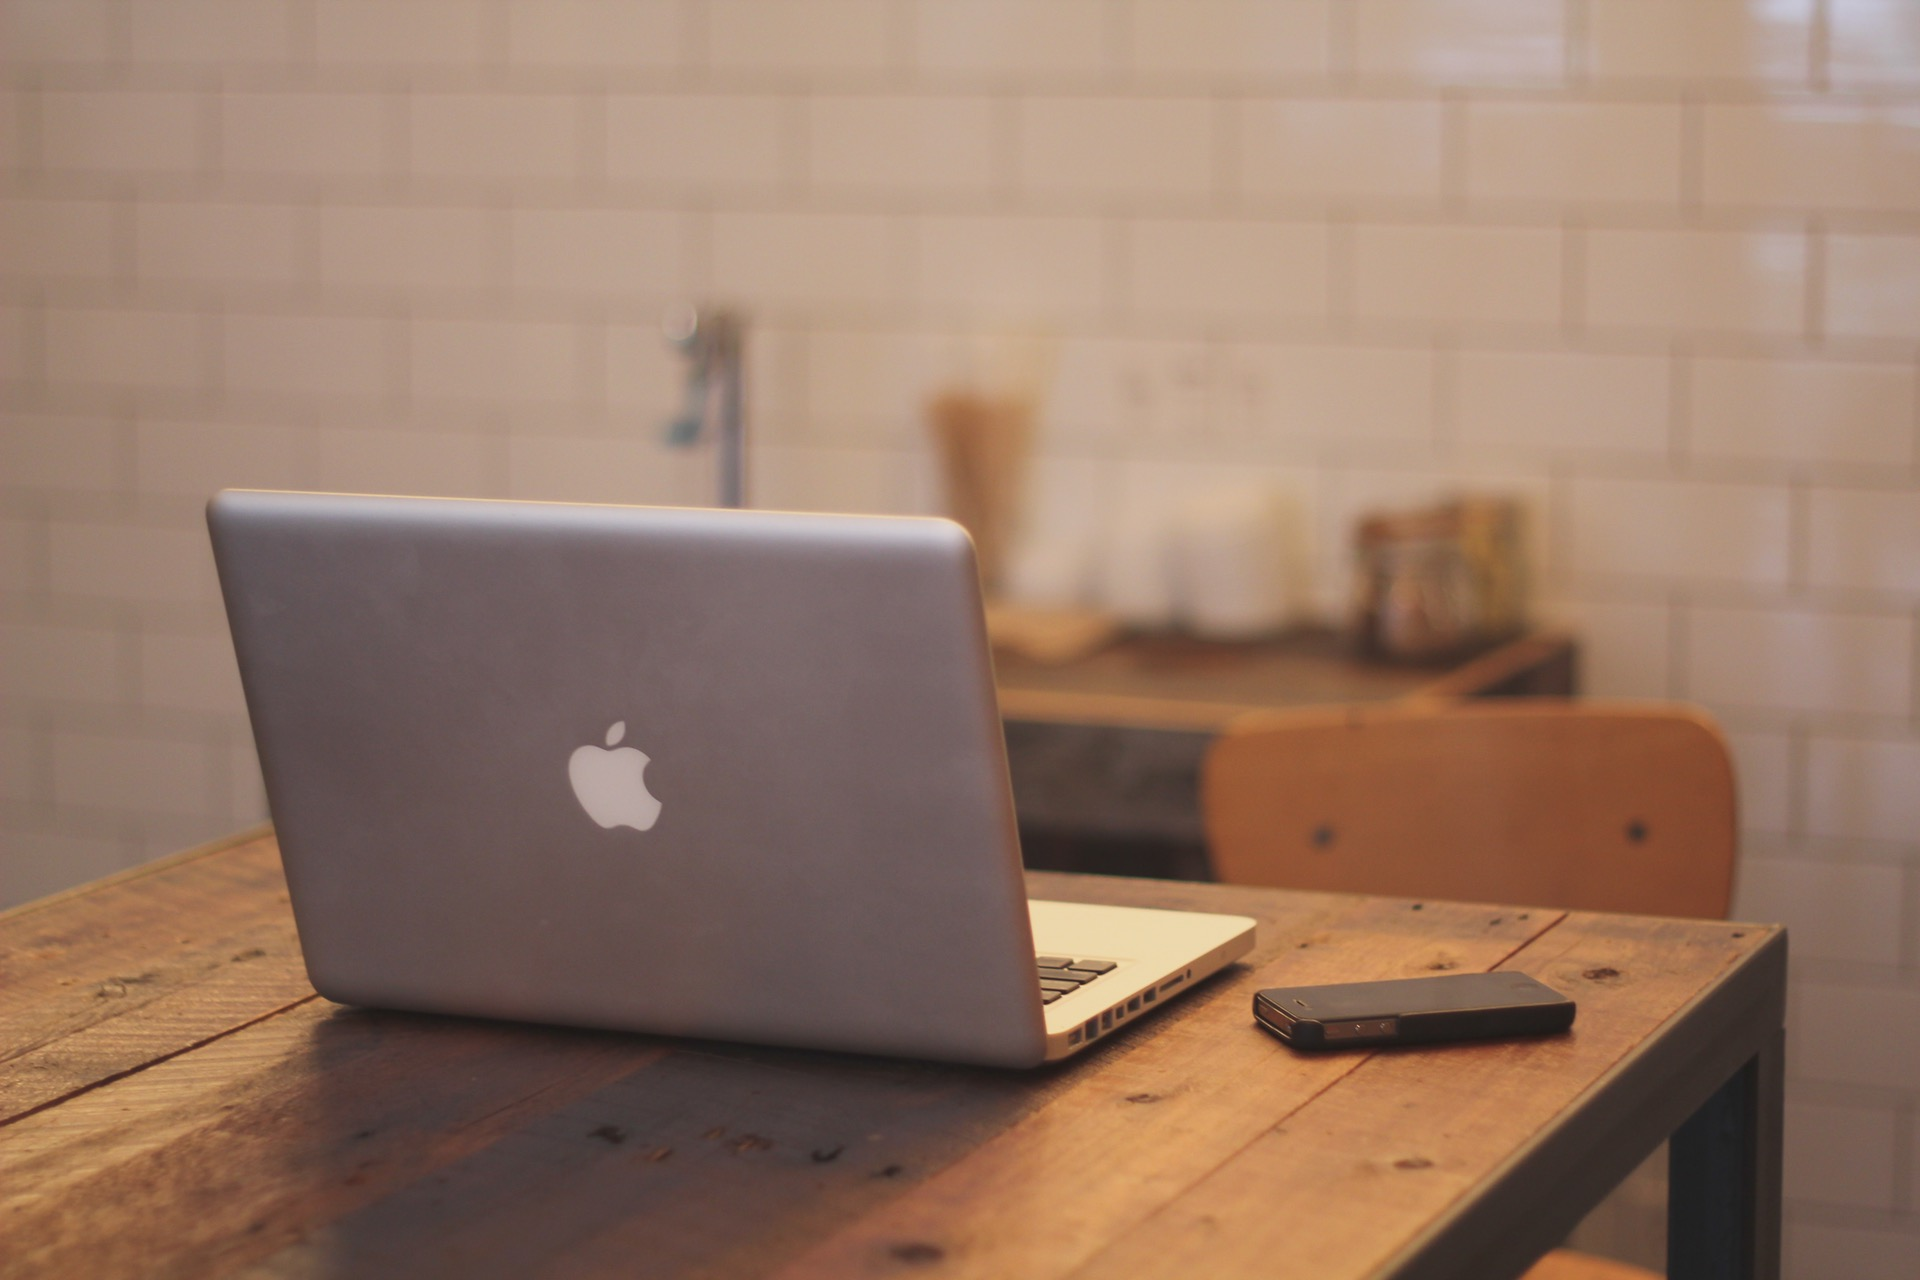 vc apple firing randrr work from home freelance remote